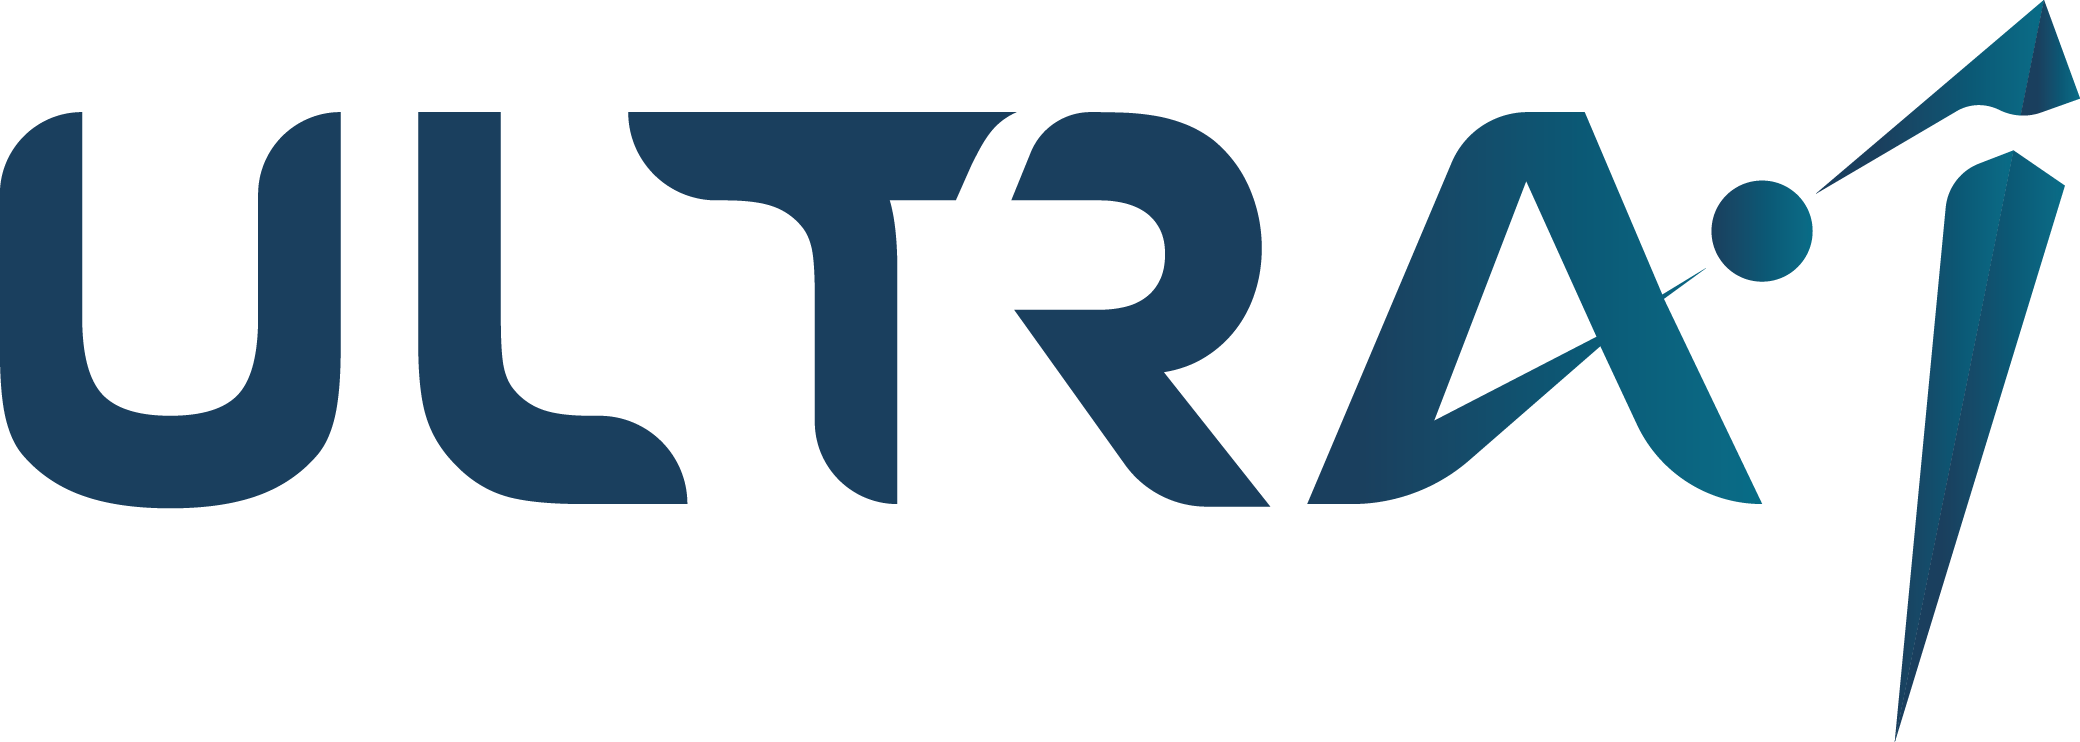 ULTRA-i Softwares